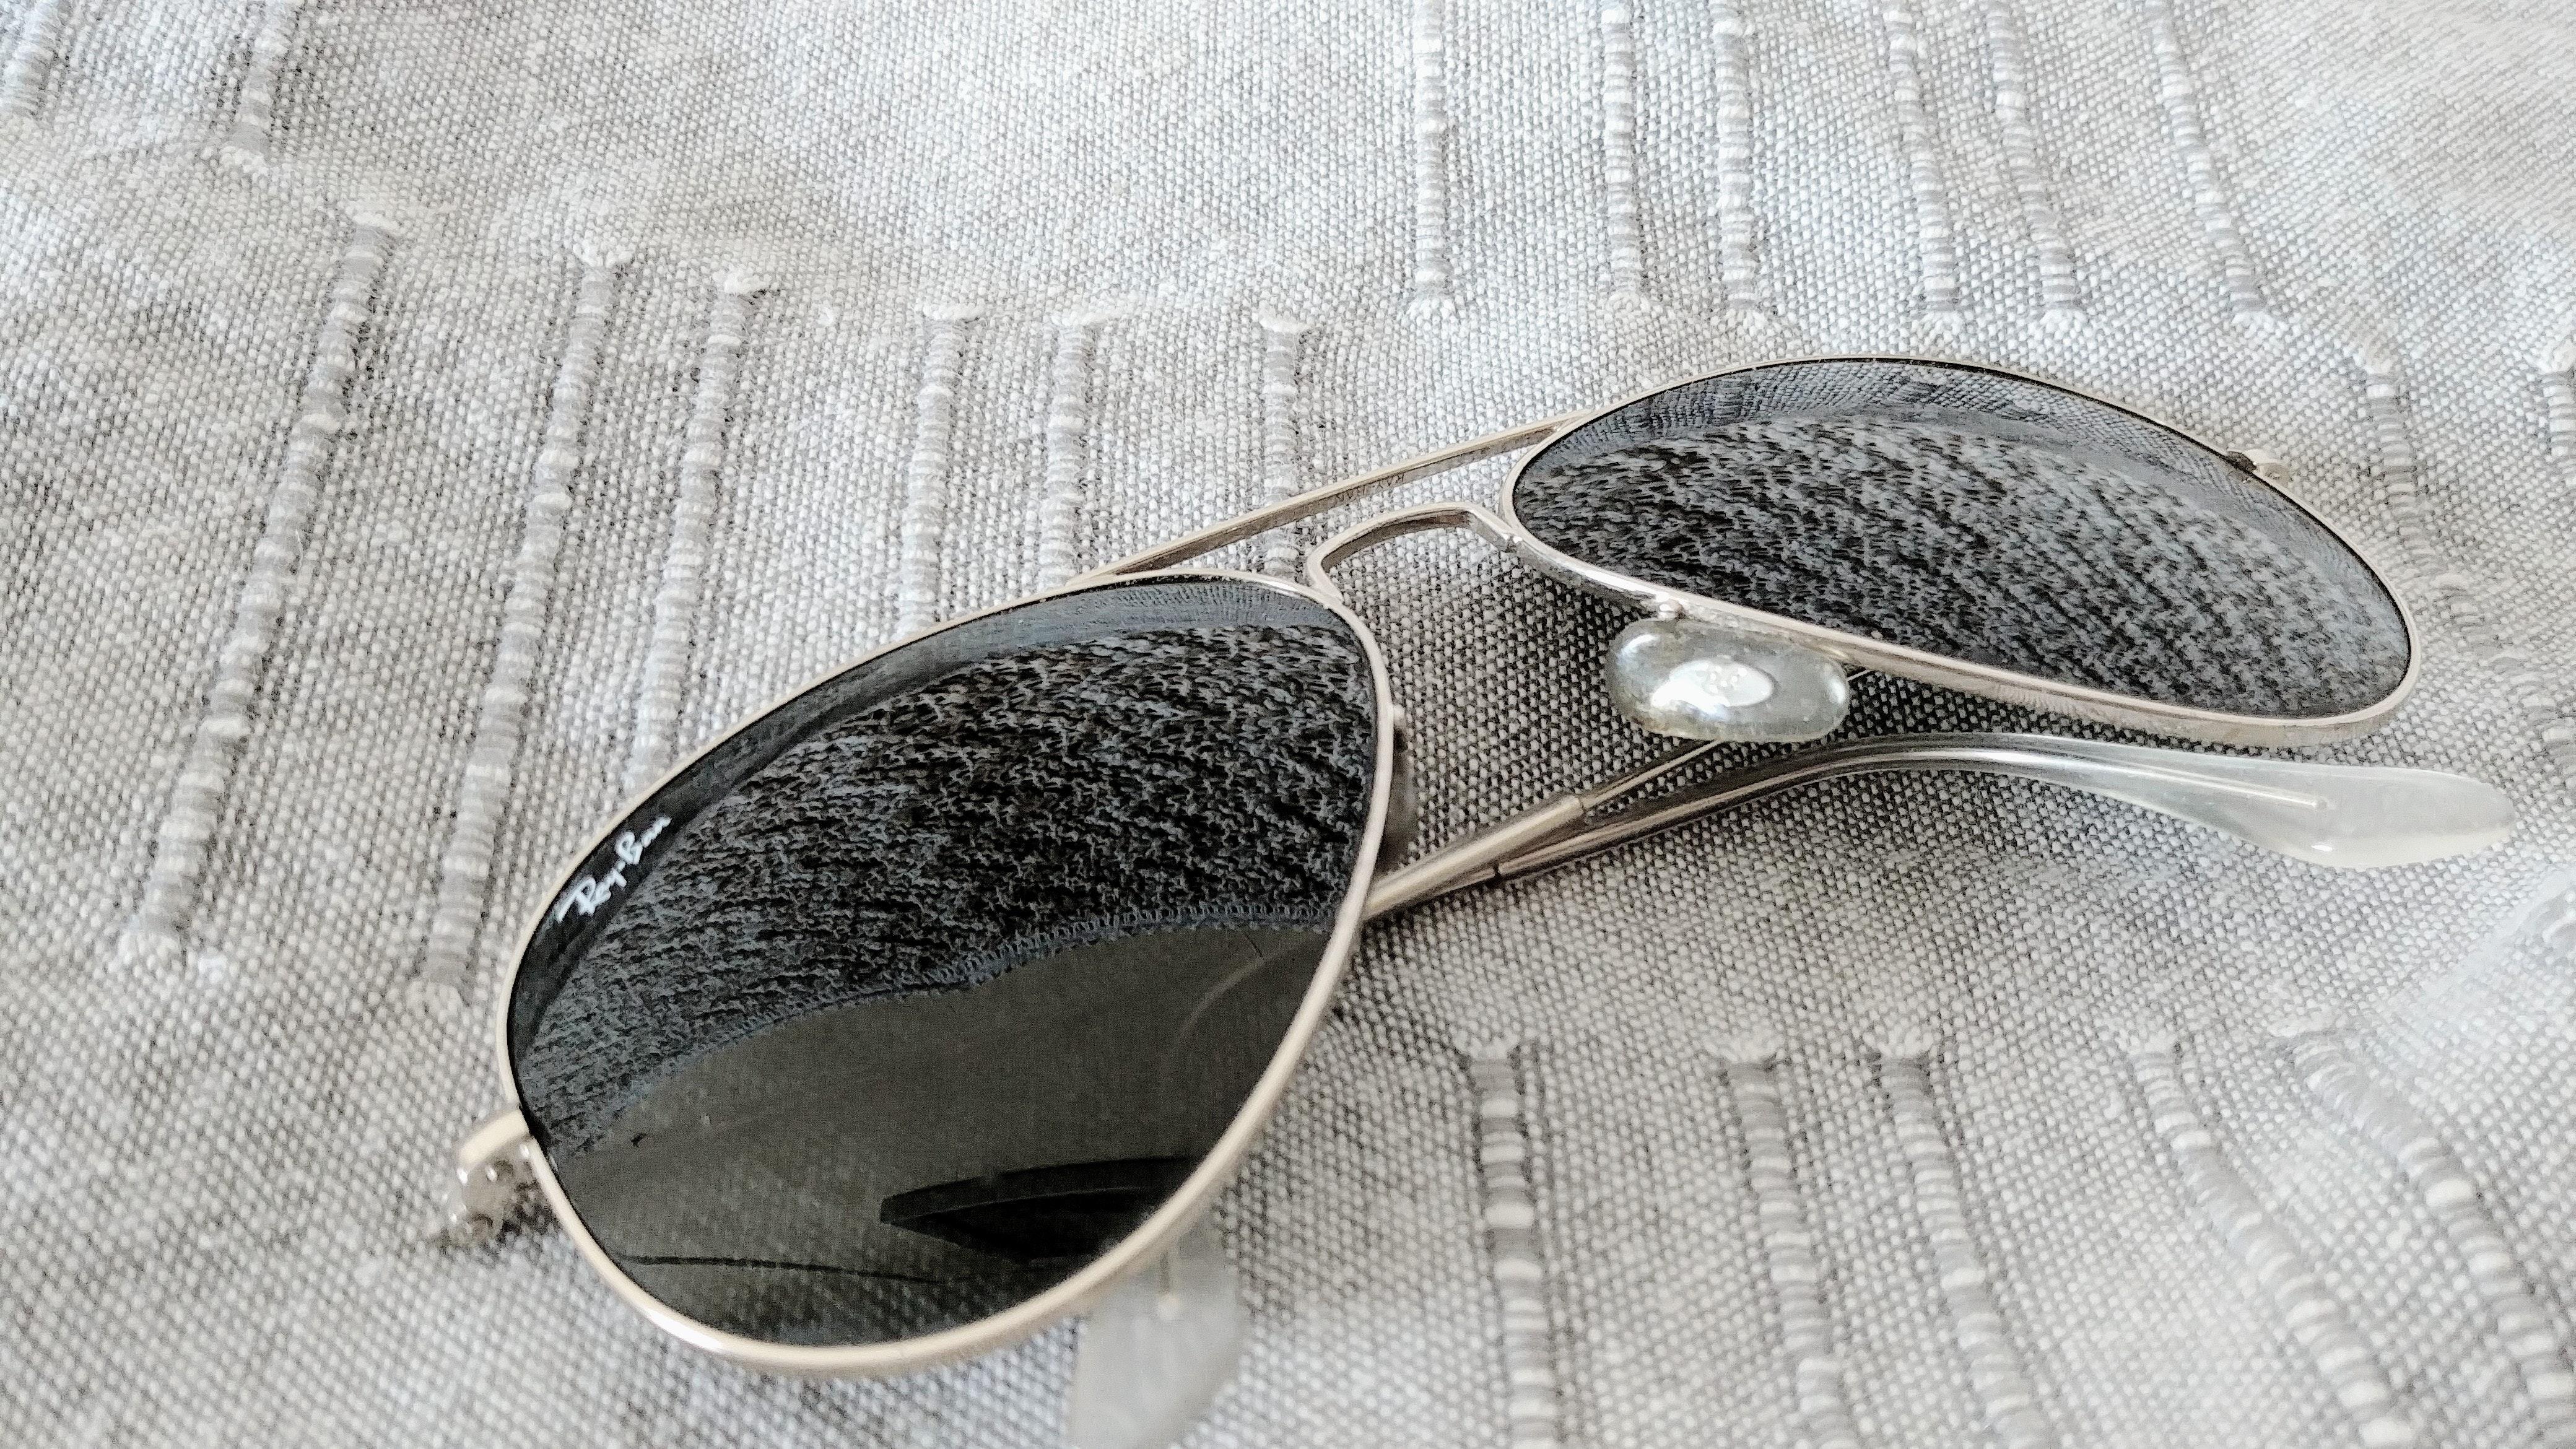 cea74f64df Free stock photo of eyewear